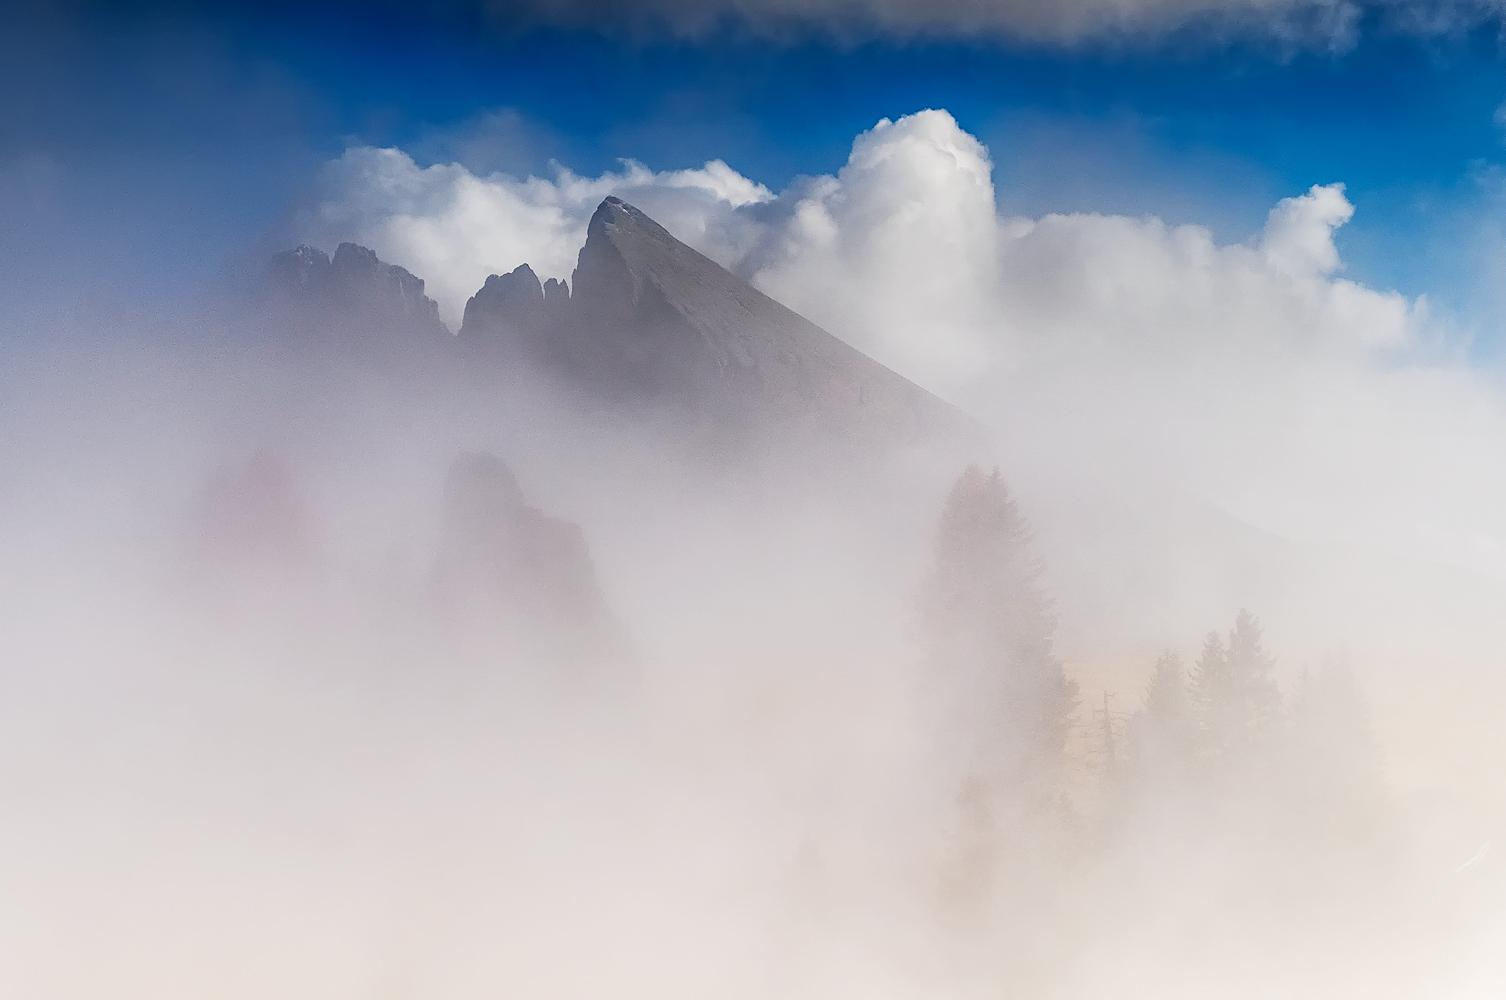 plattkofel im nebel